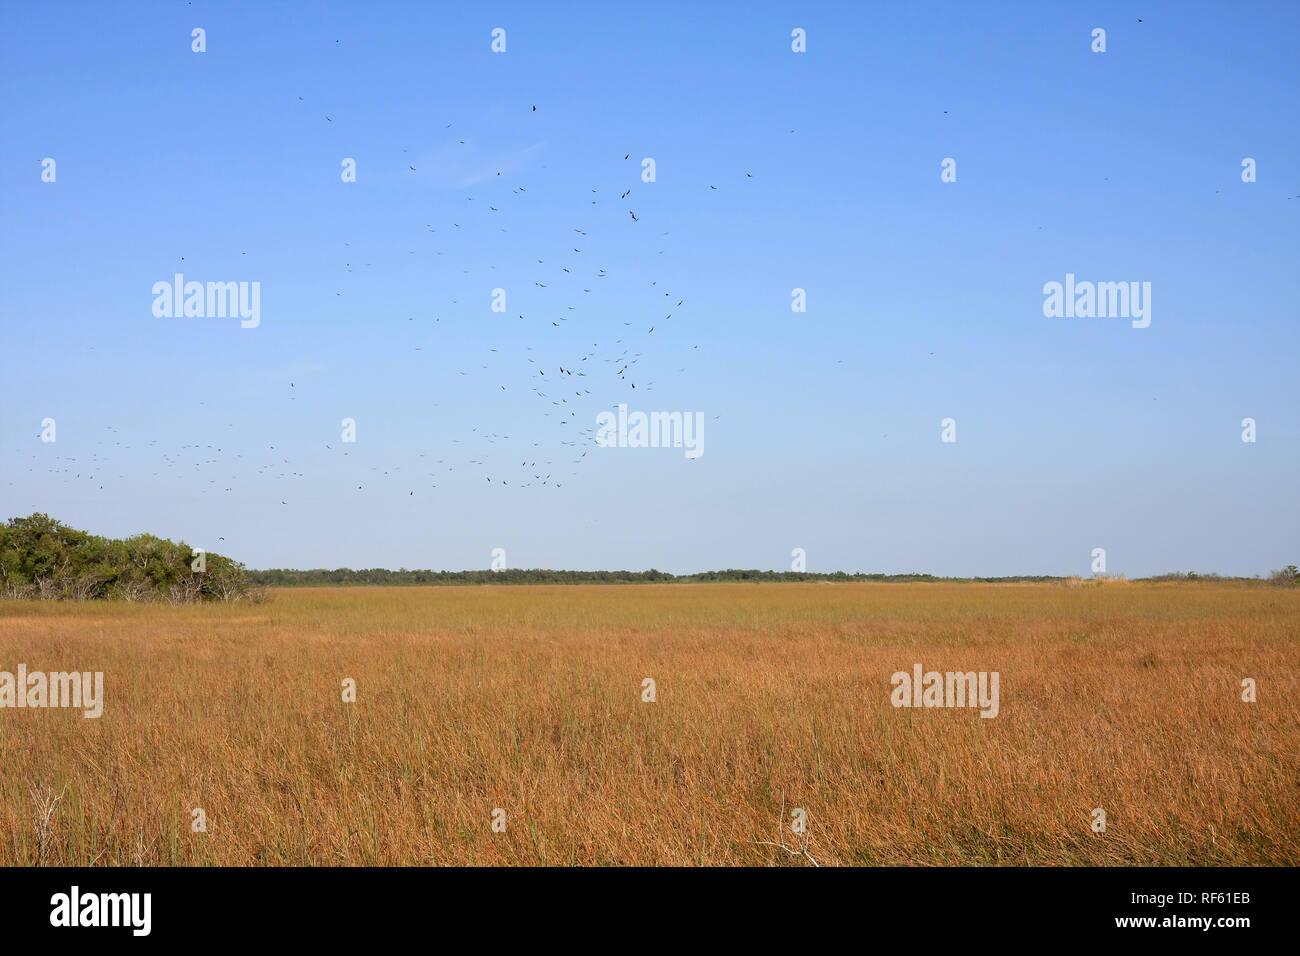 The Sawgrass Prairie of Everglades National Park, Florida. - Stock Image